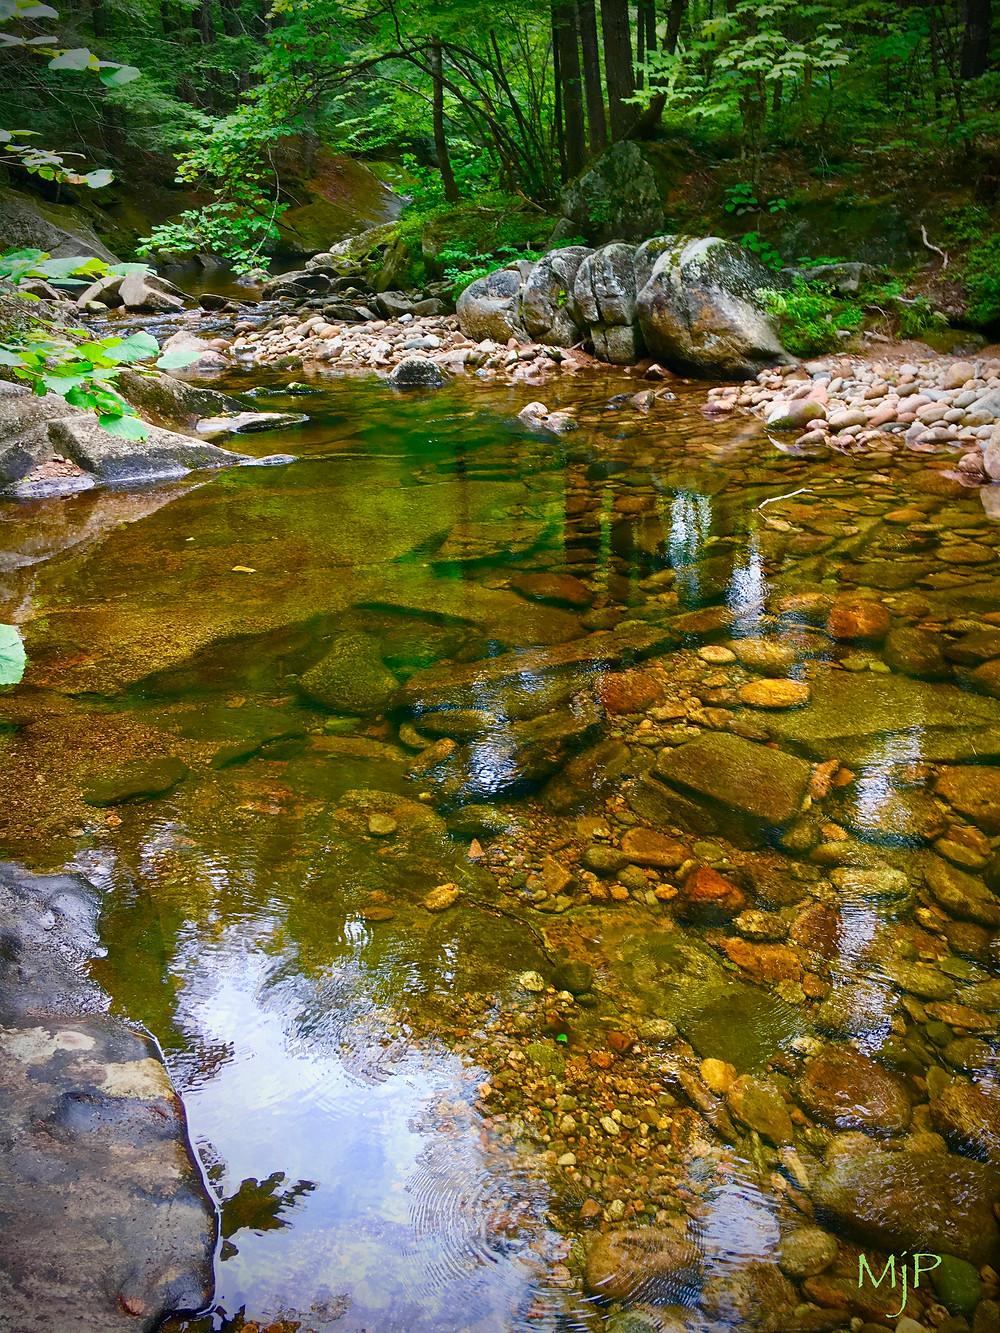 Sacred River, Mj Pettengill